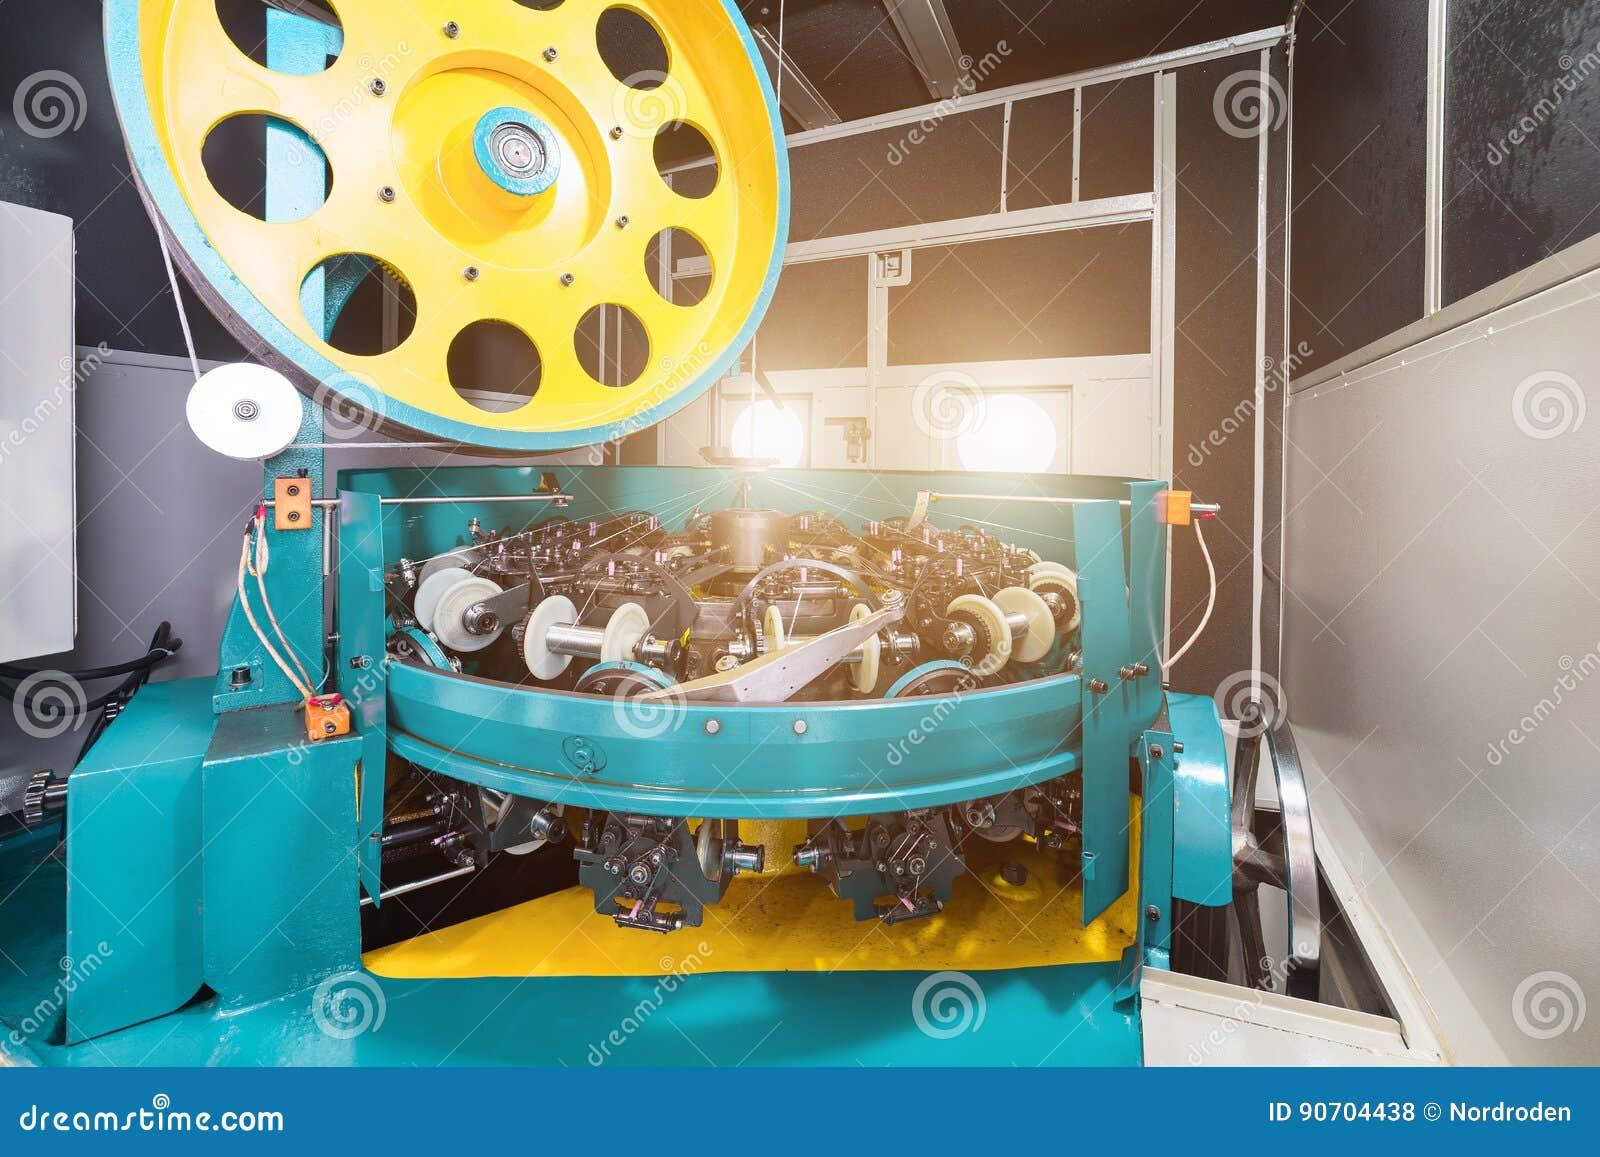 High-speed Braiding Machine. Stock Photo - Image of mechanism, open ...